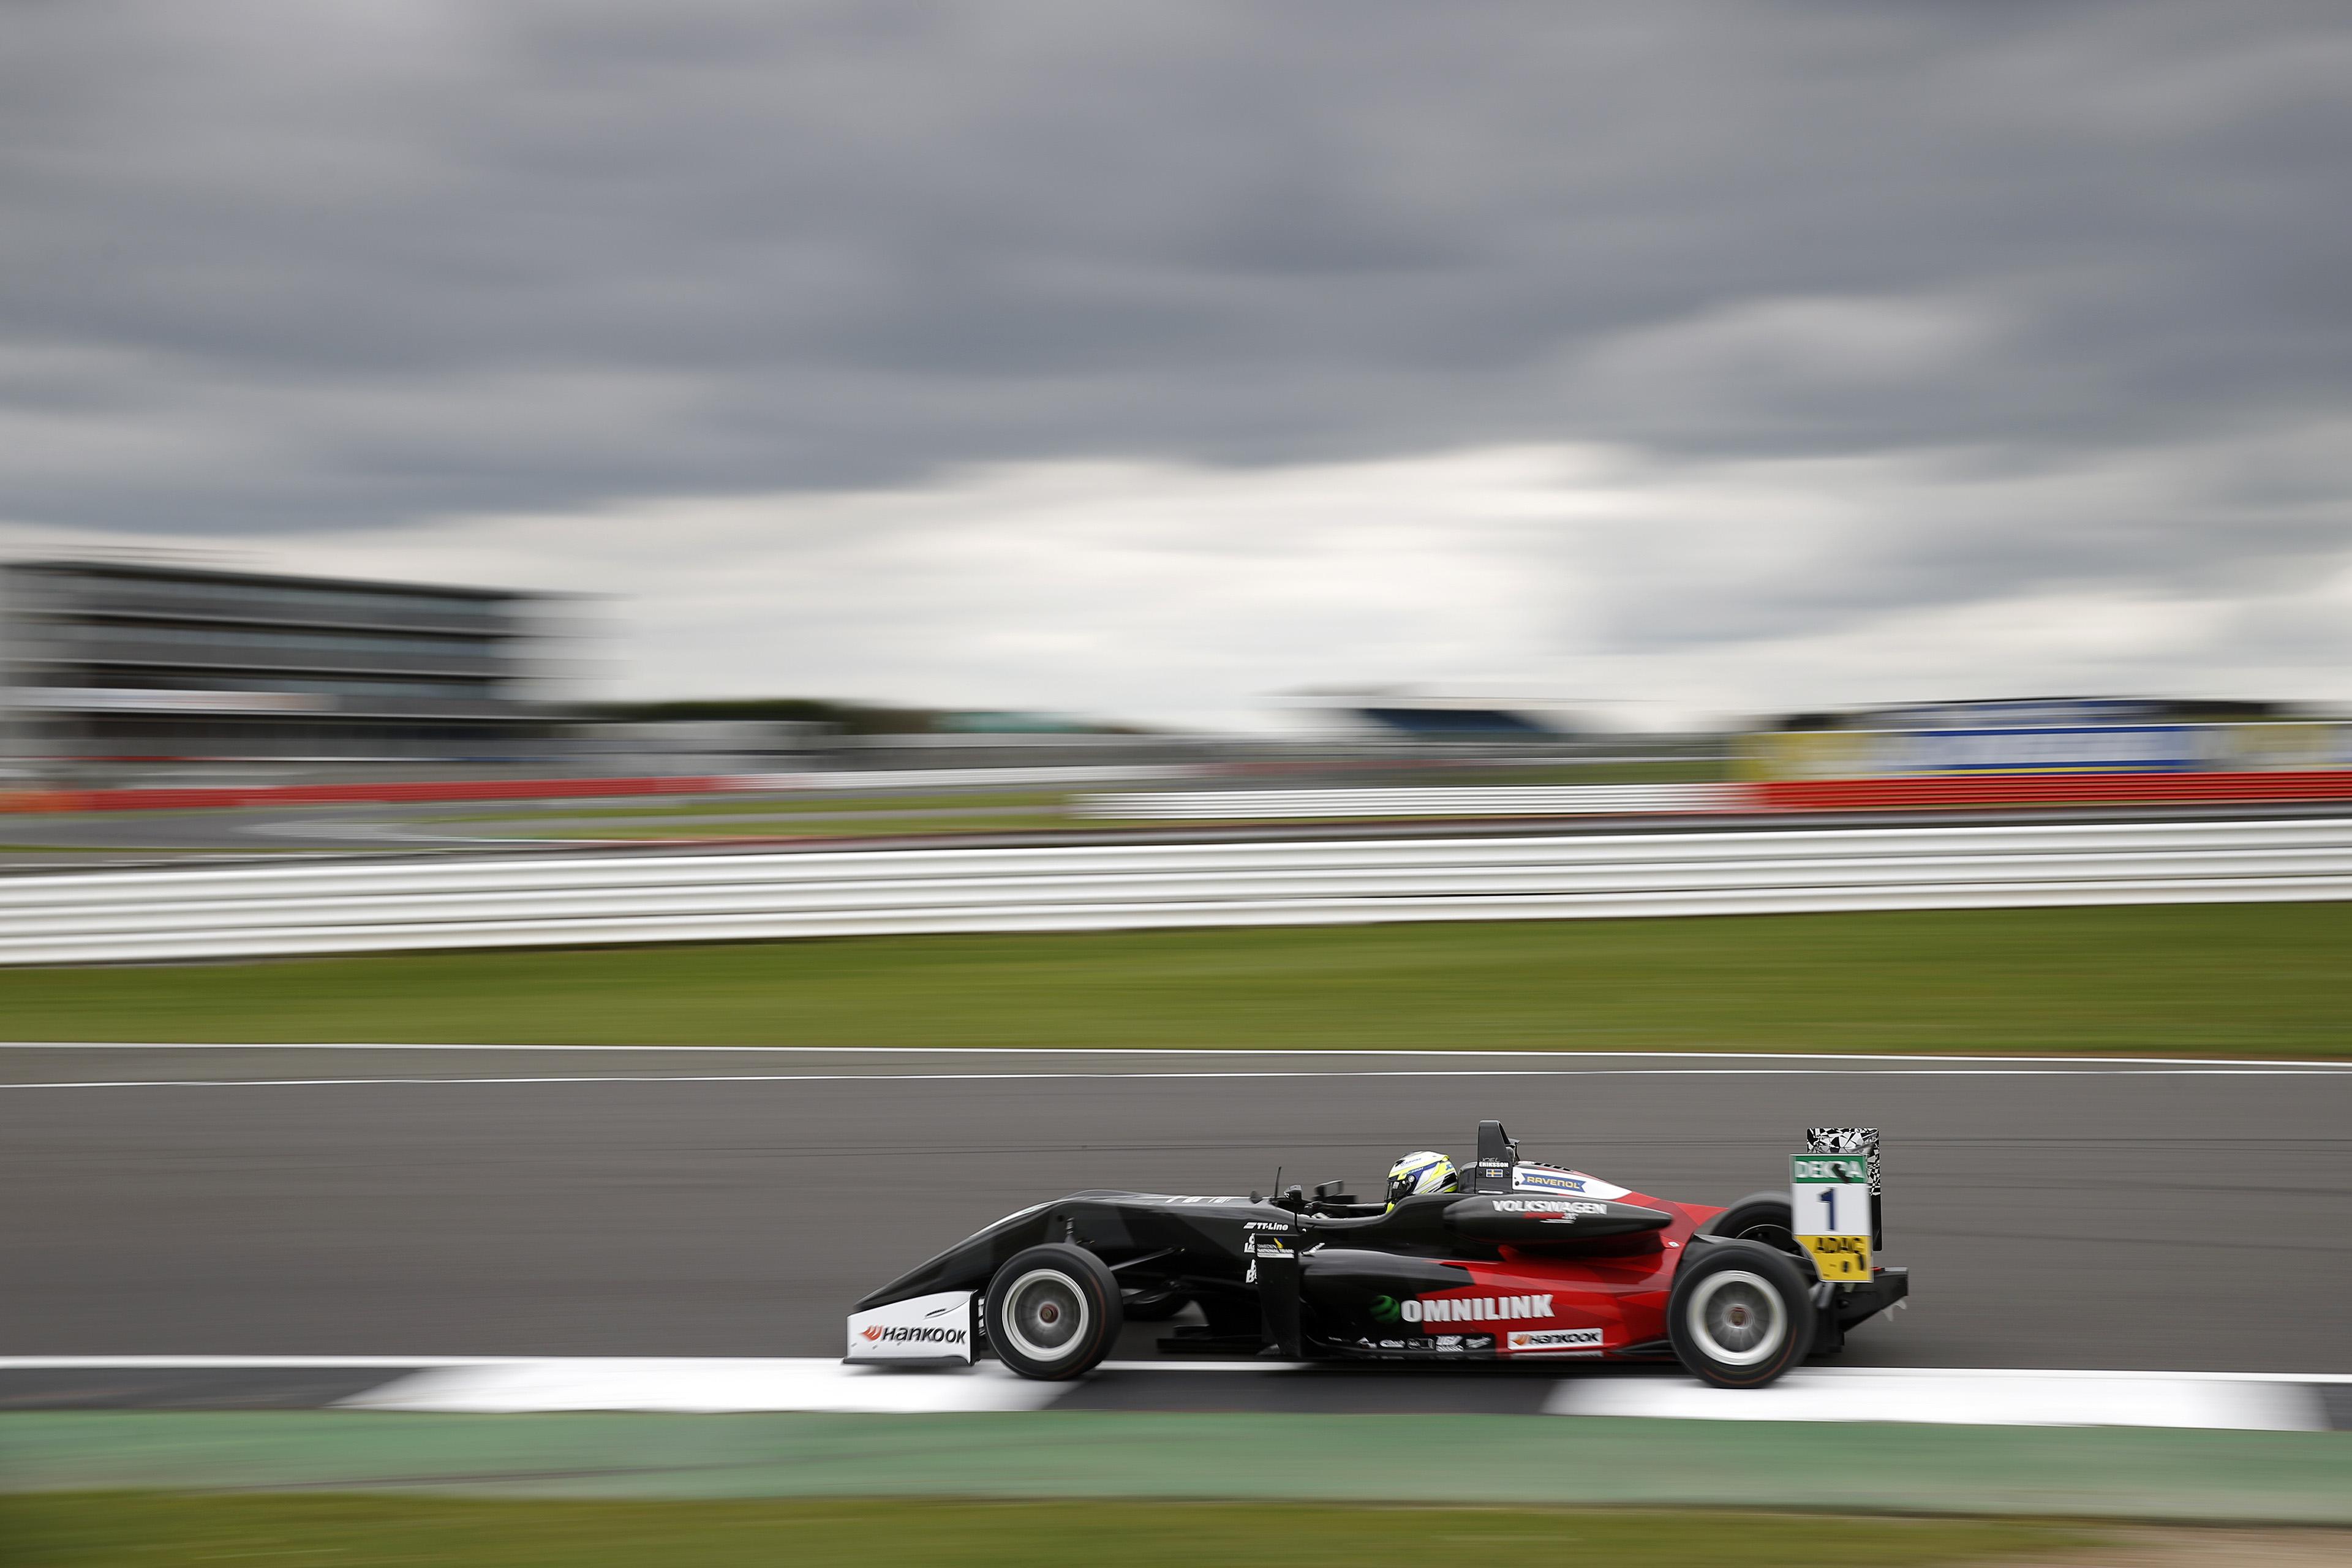 2017-FIA-F3-01-Suer-0274